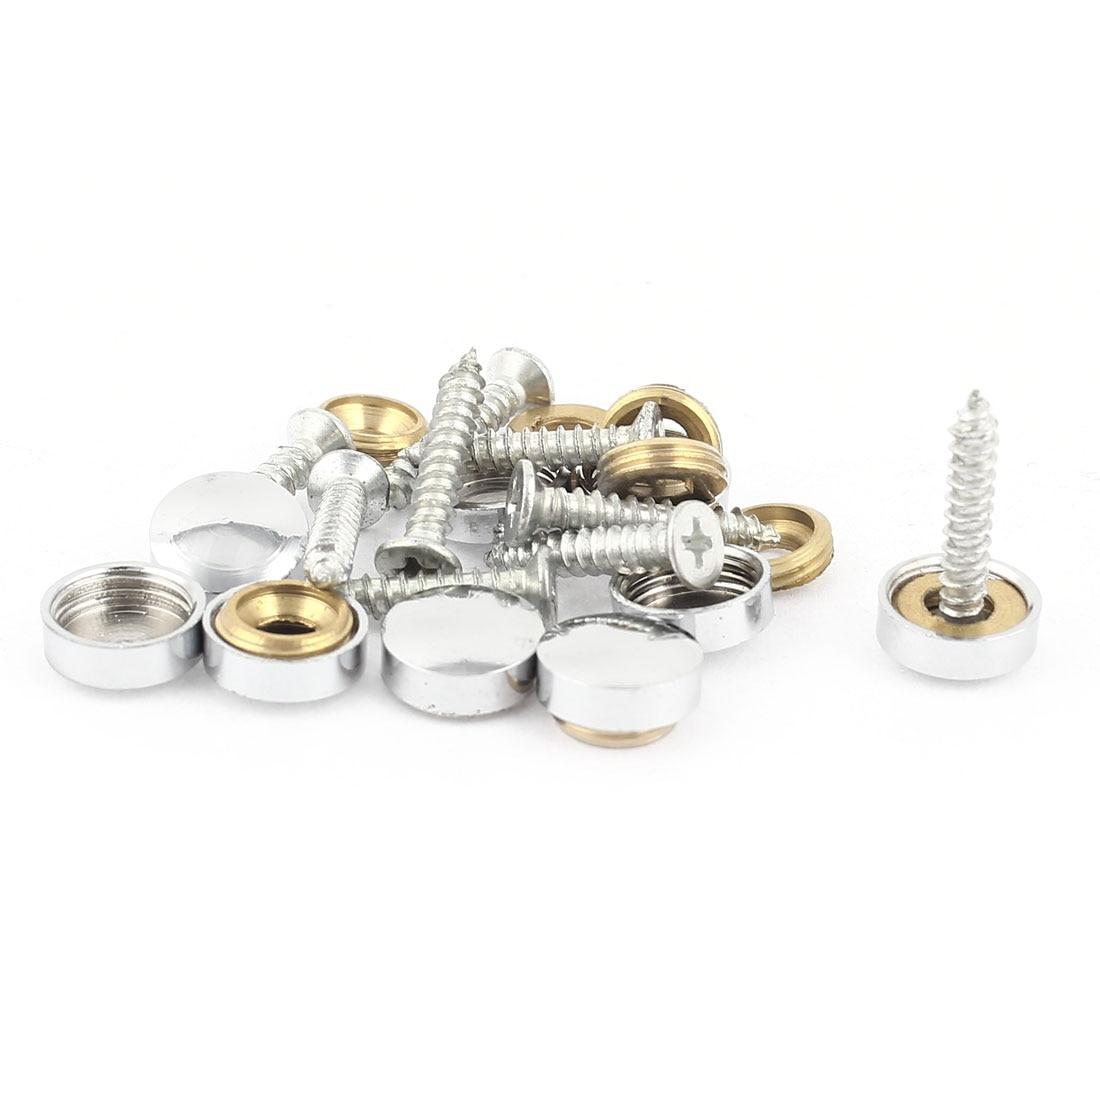 "Miniature Small Brass Eye Screws 1//2/"" 1.3 cm 4 ct Long: DOLLHOUSE Hardware"